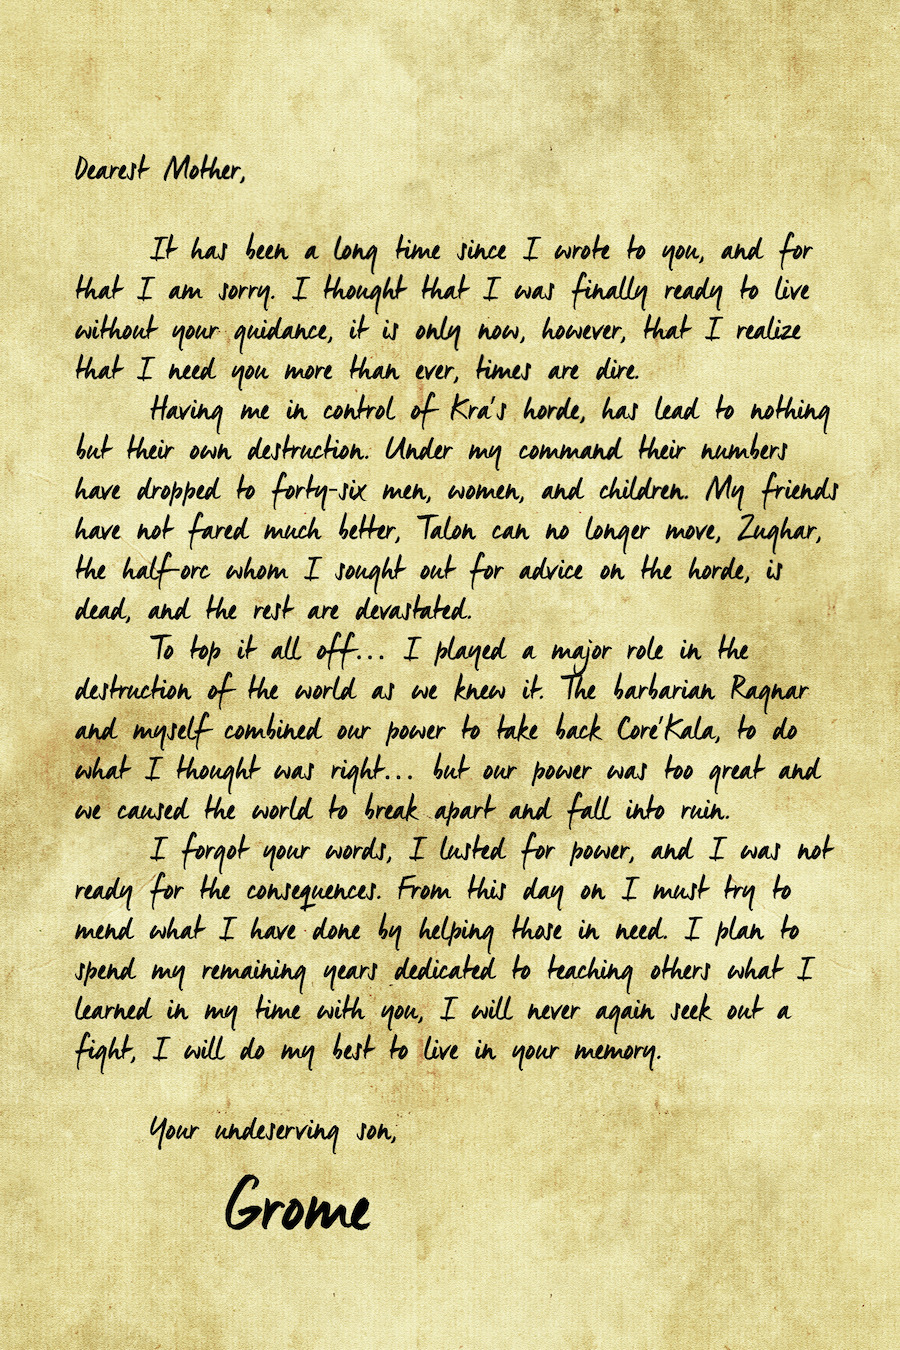 Grome final letter